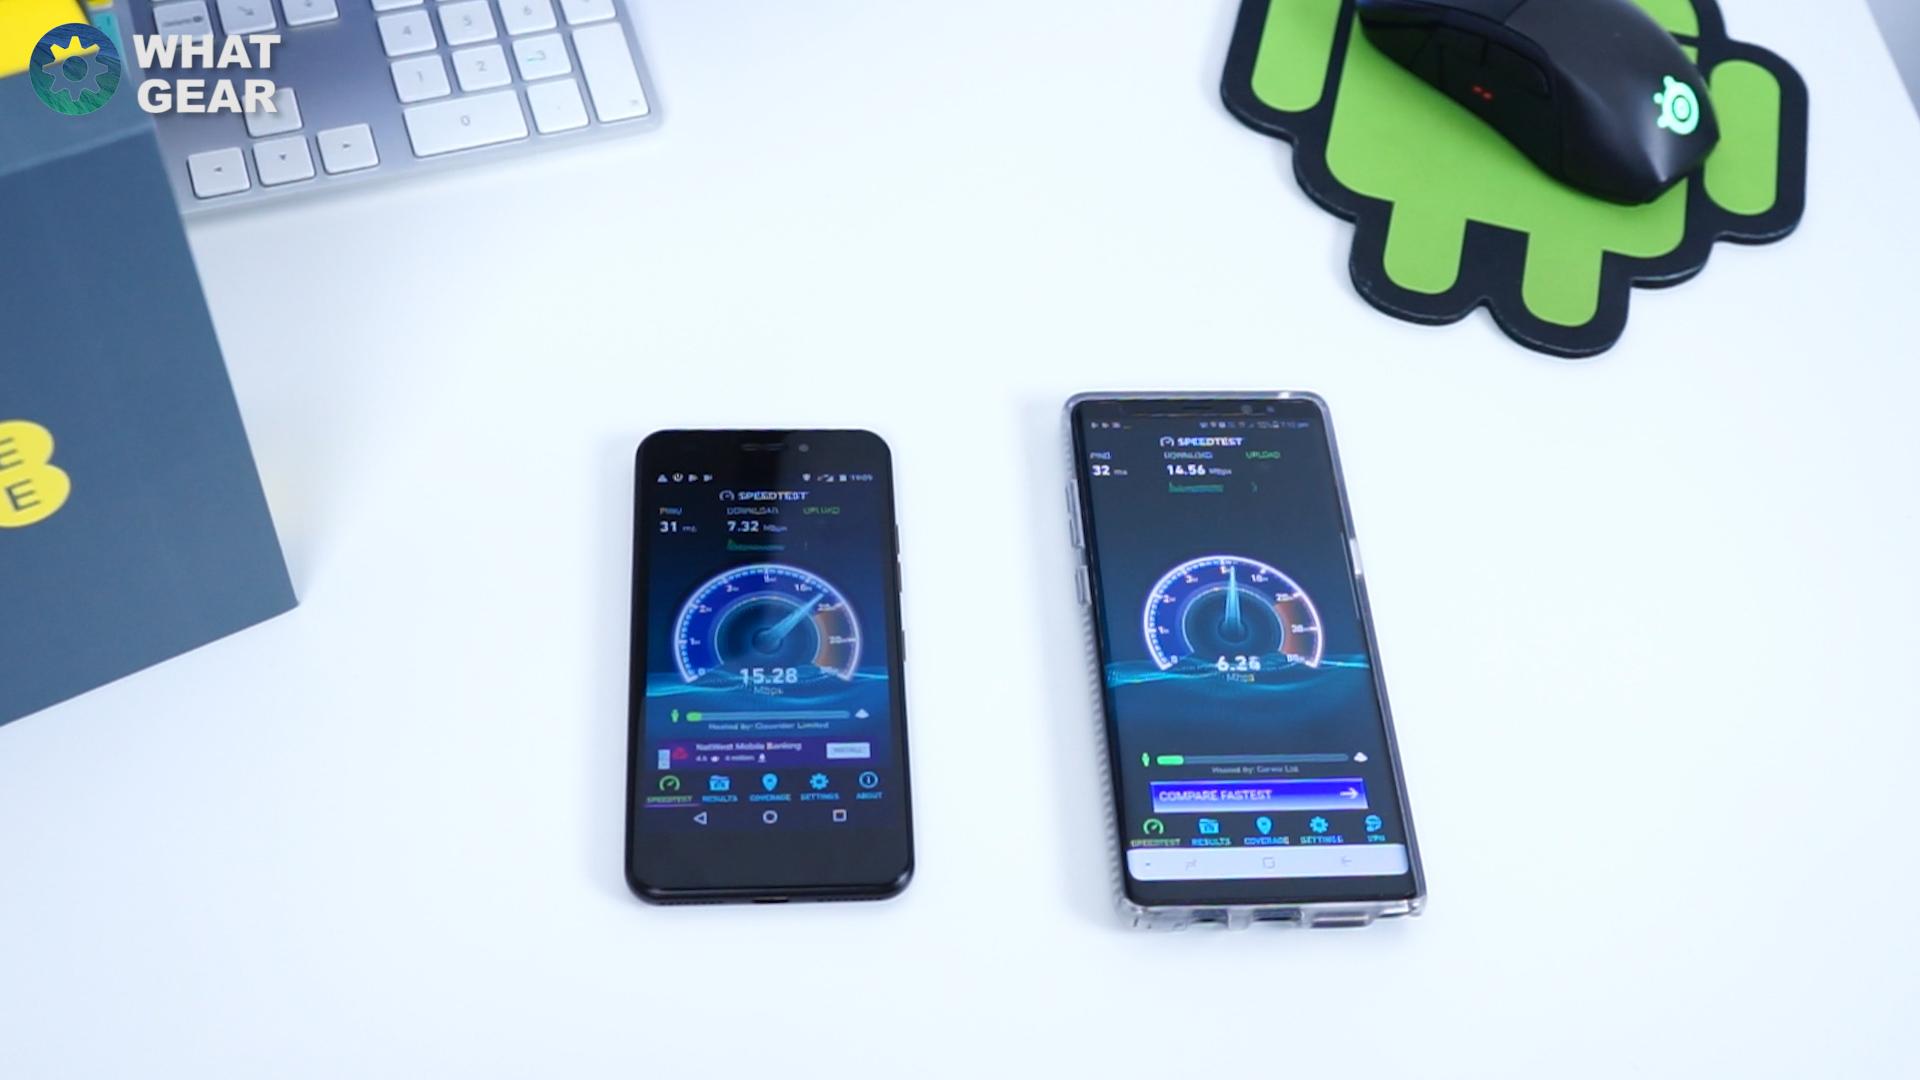 ee hawk 4g speed.jpg